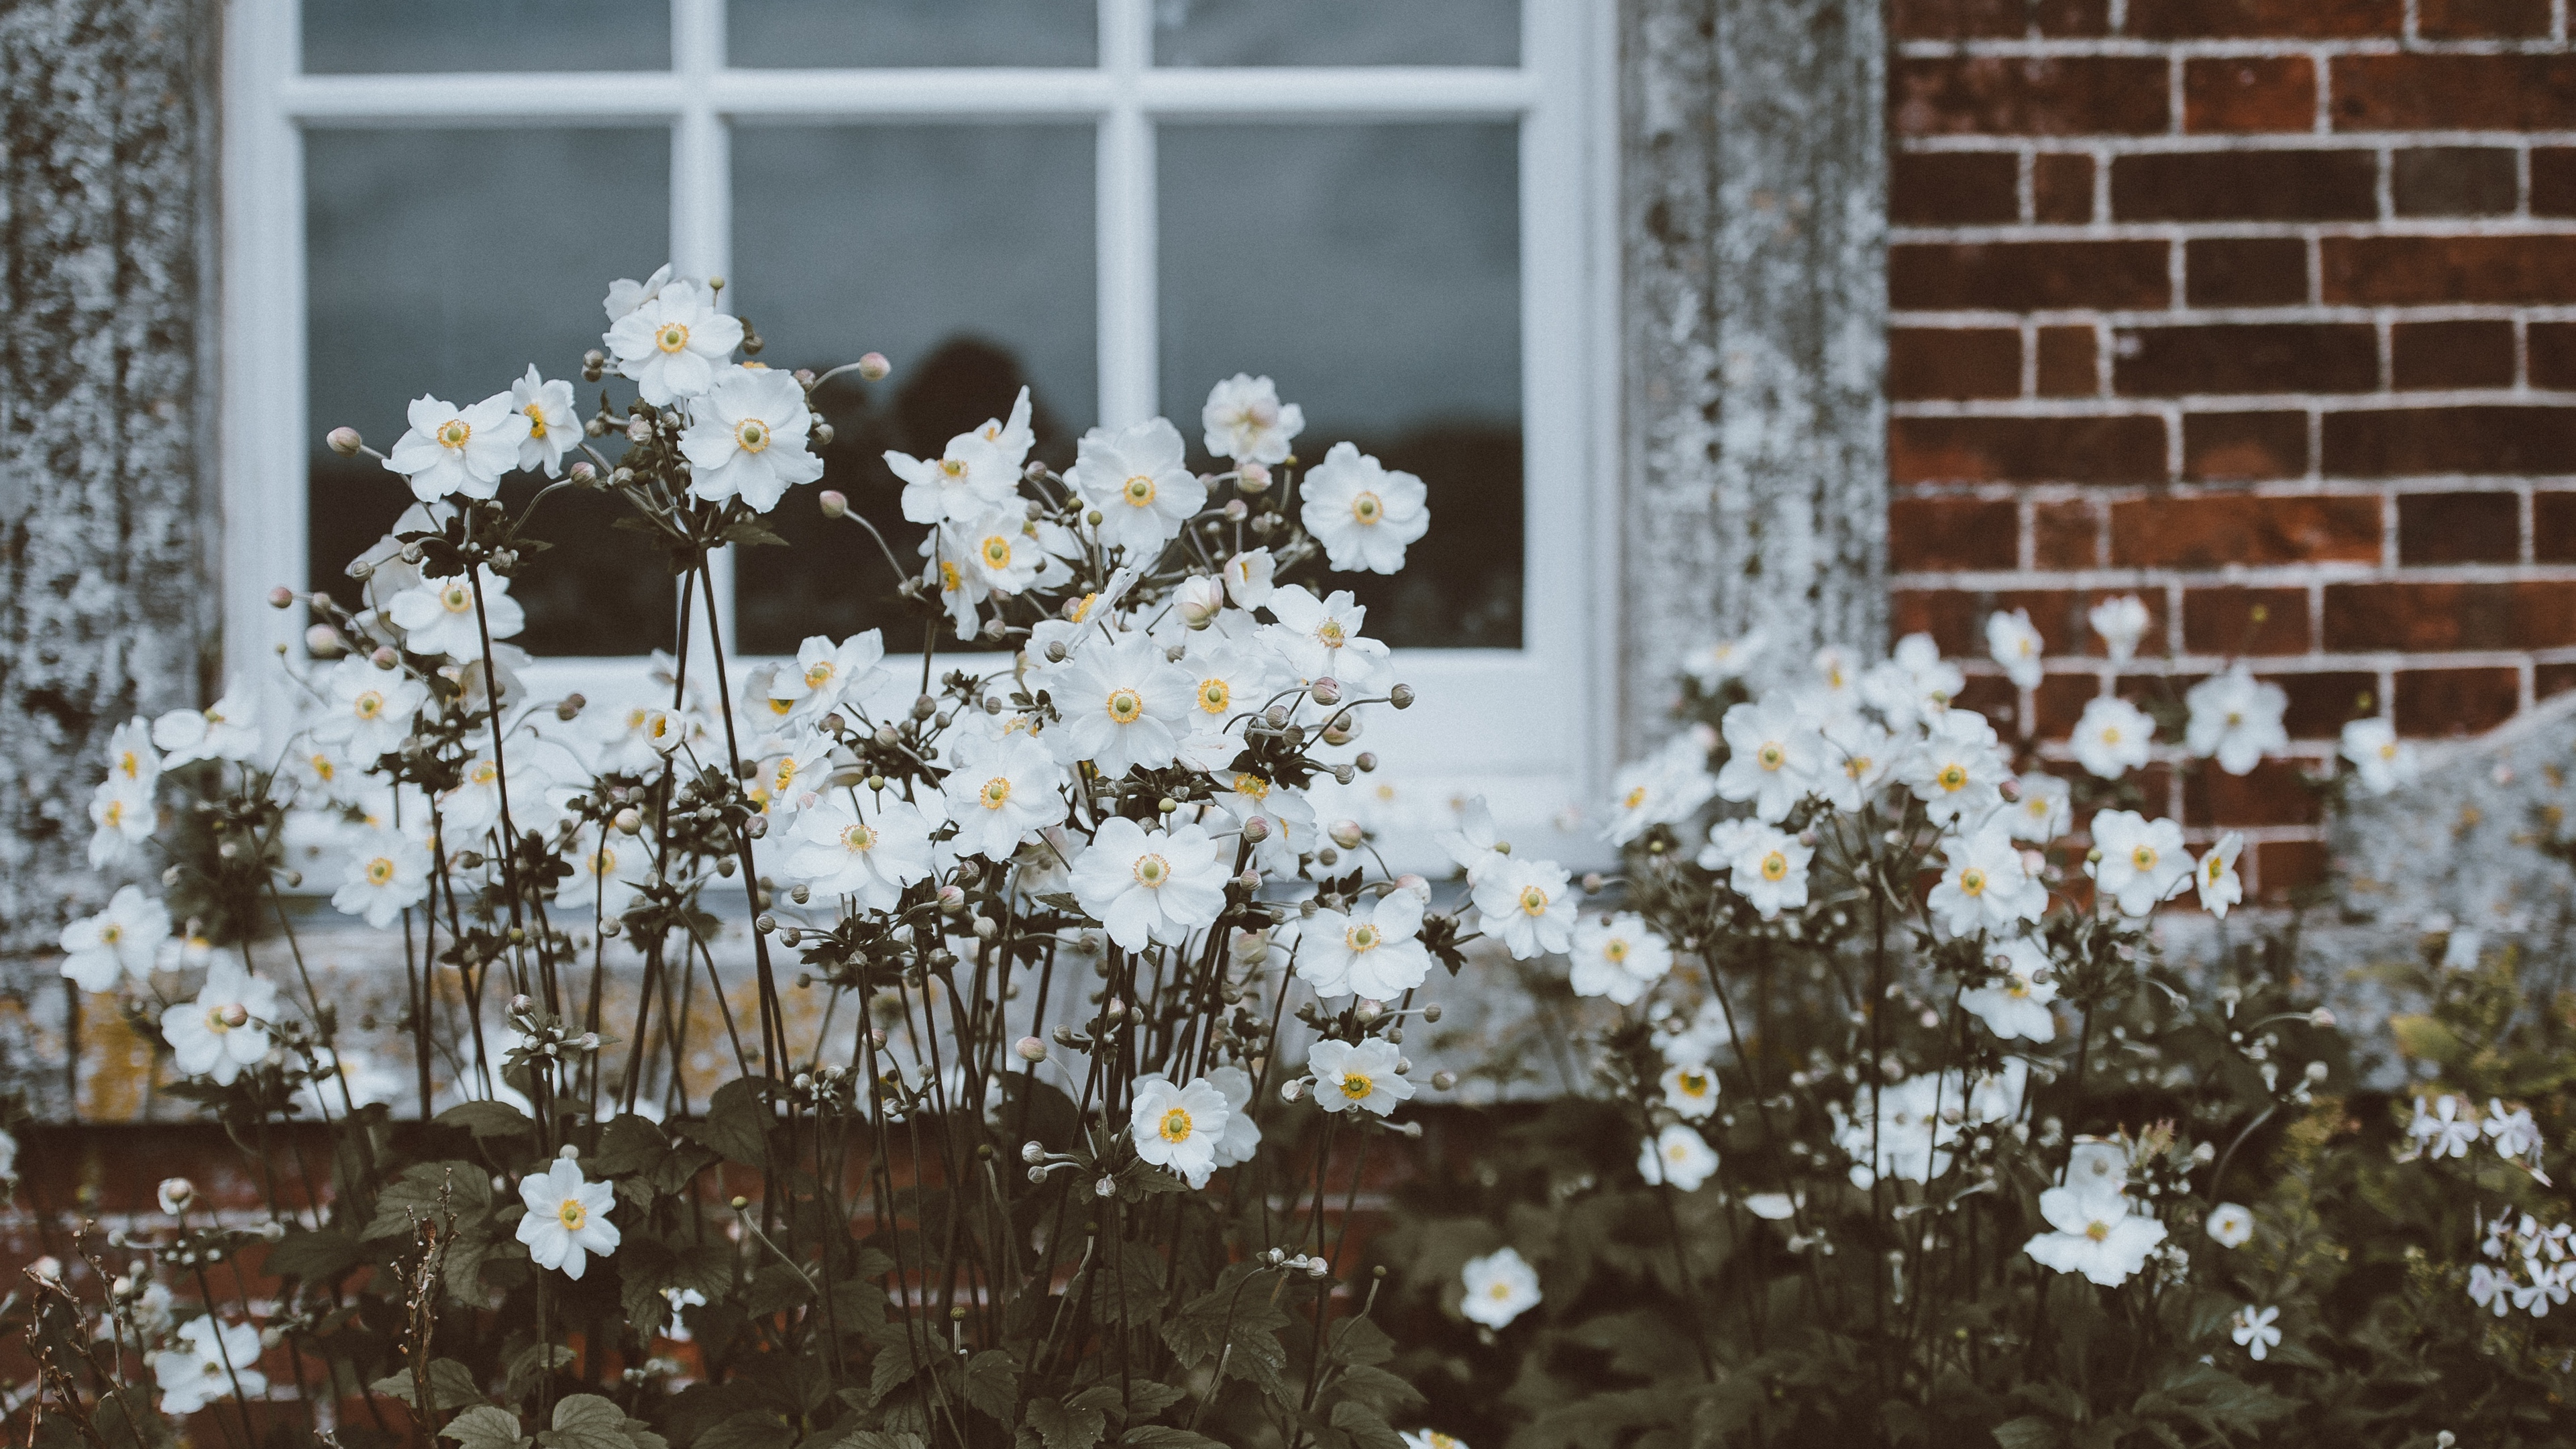 flowers window flower bed 4k 1540064419 - flowers, window, flower bed 4k - Window, Flowers, flower bed